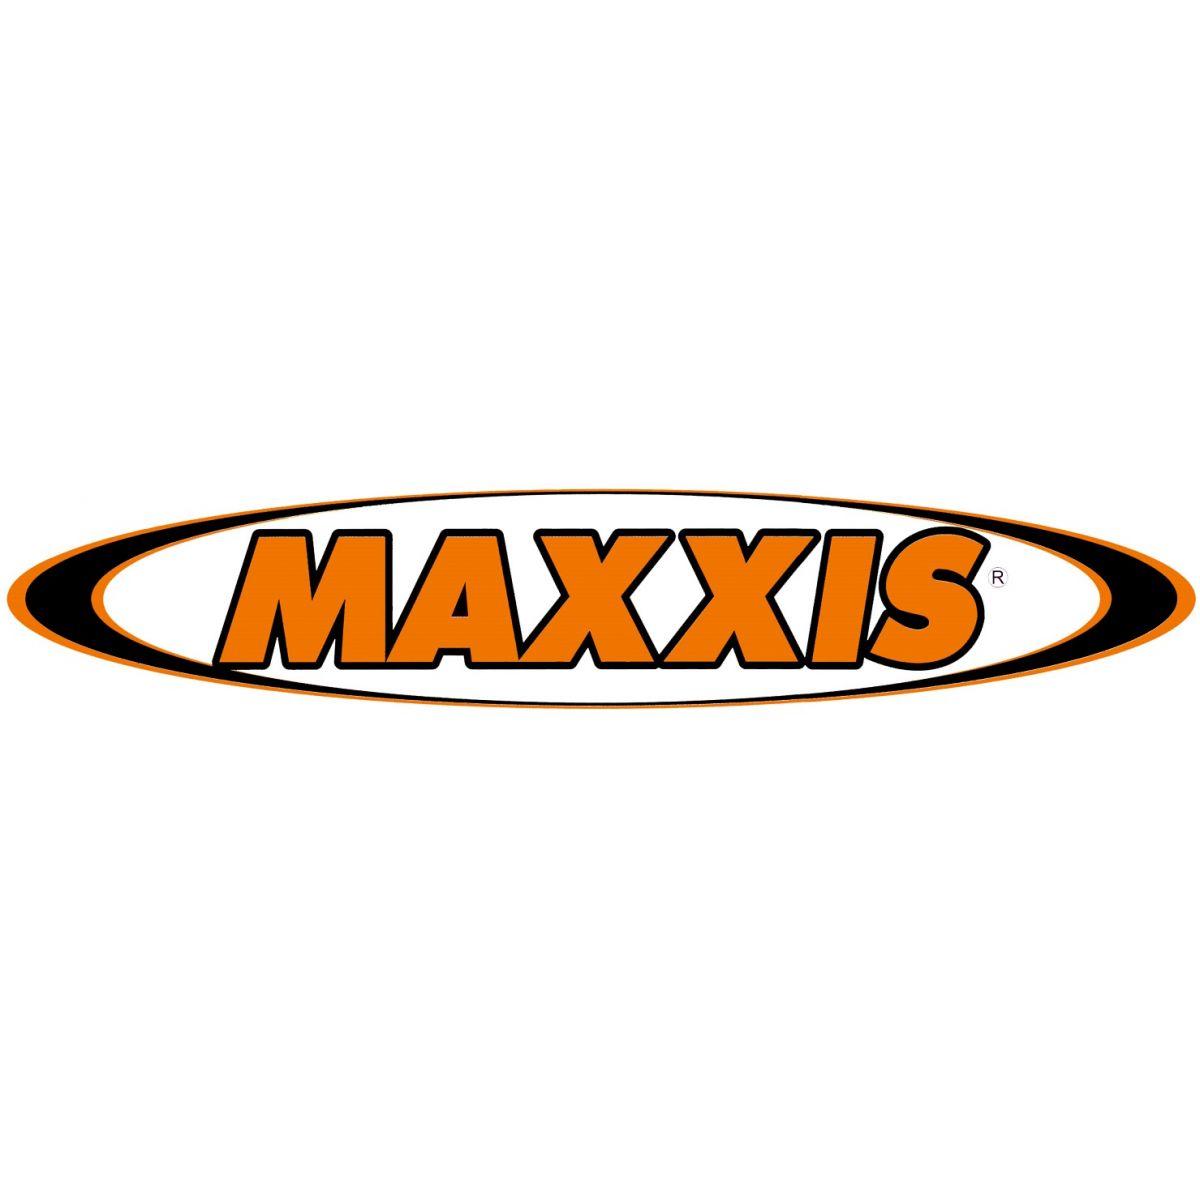 Pneu 80/100-21 Maxxis M6001 51M Moto Cross Honda, Kawasaki (Dianteiro)